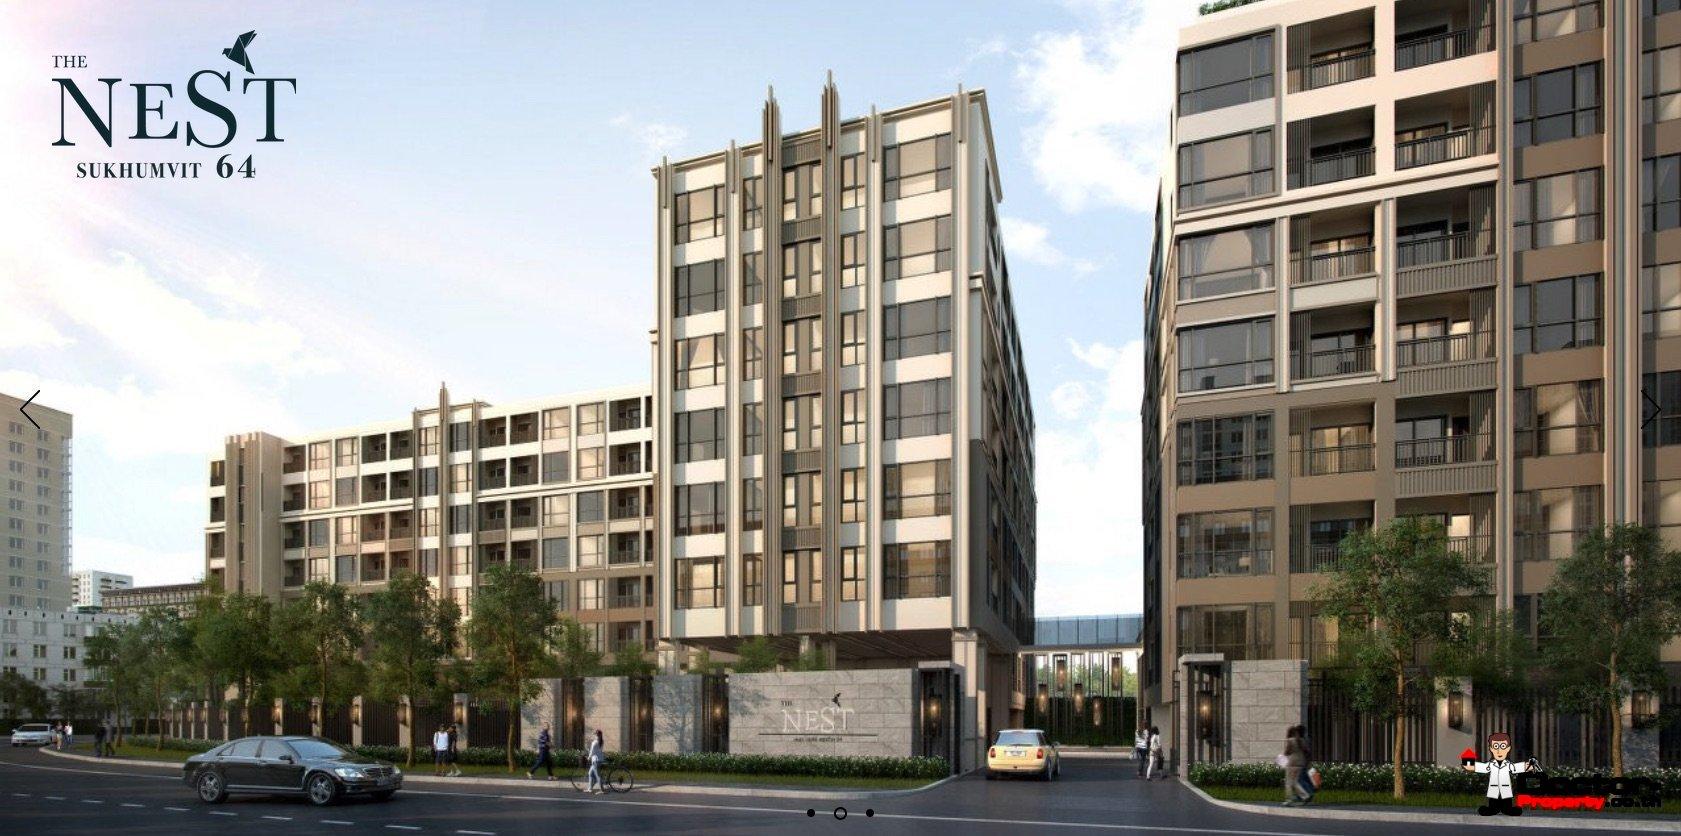 New 1 Bed Apartment - The Nest Sukhumvit 64 - Bangkok for ...